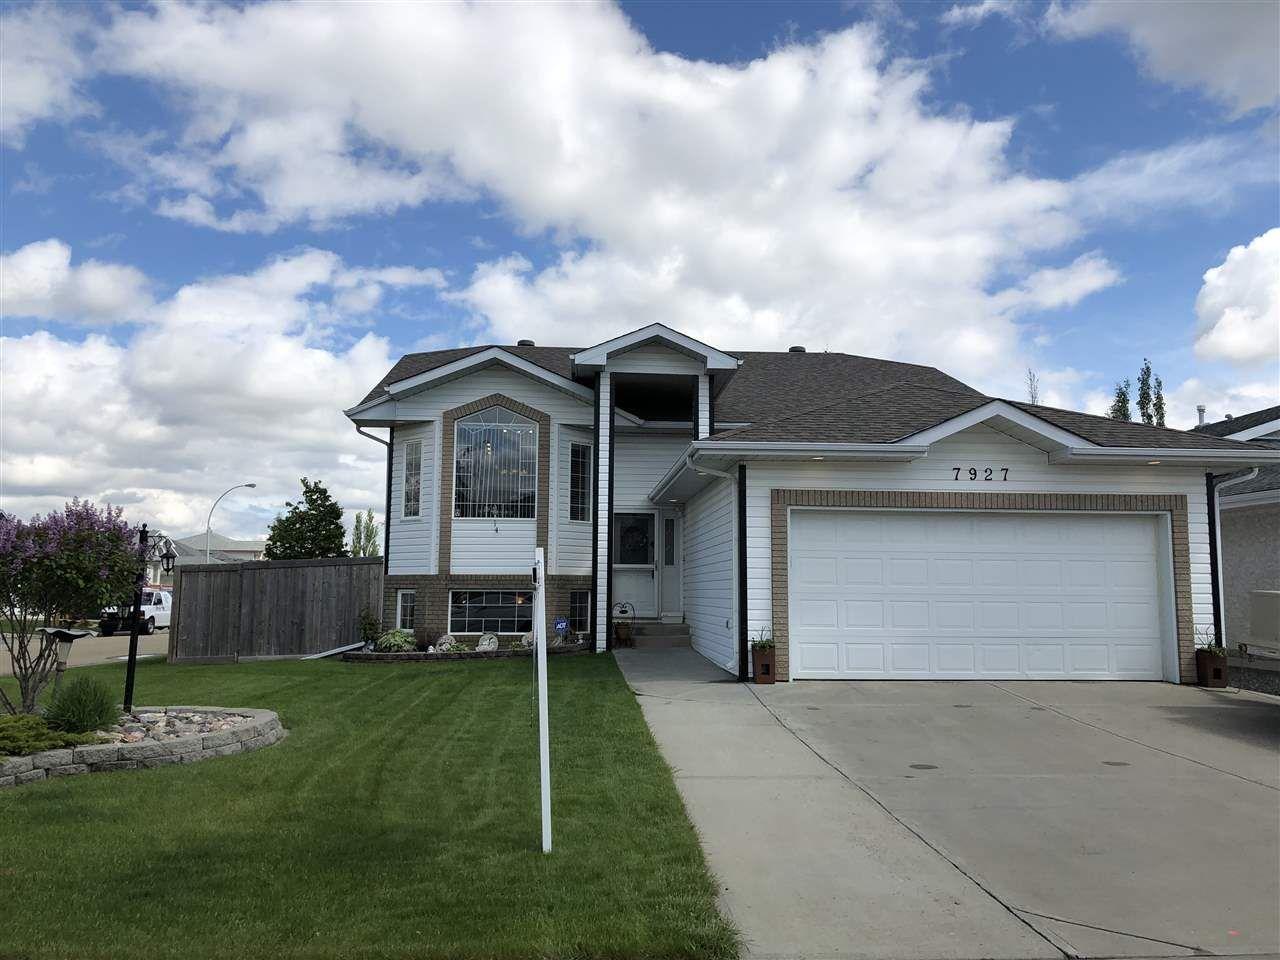 Main Photo: 7927 165 Avenue in Edmonton: Zone 28 House for sale : MLS®# E4158382